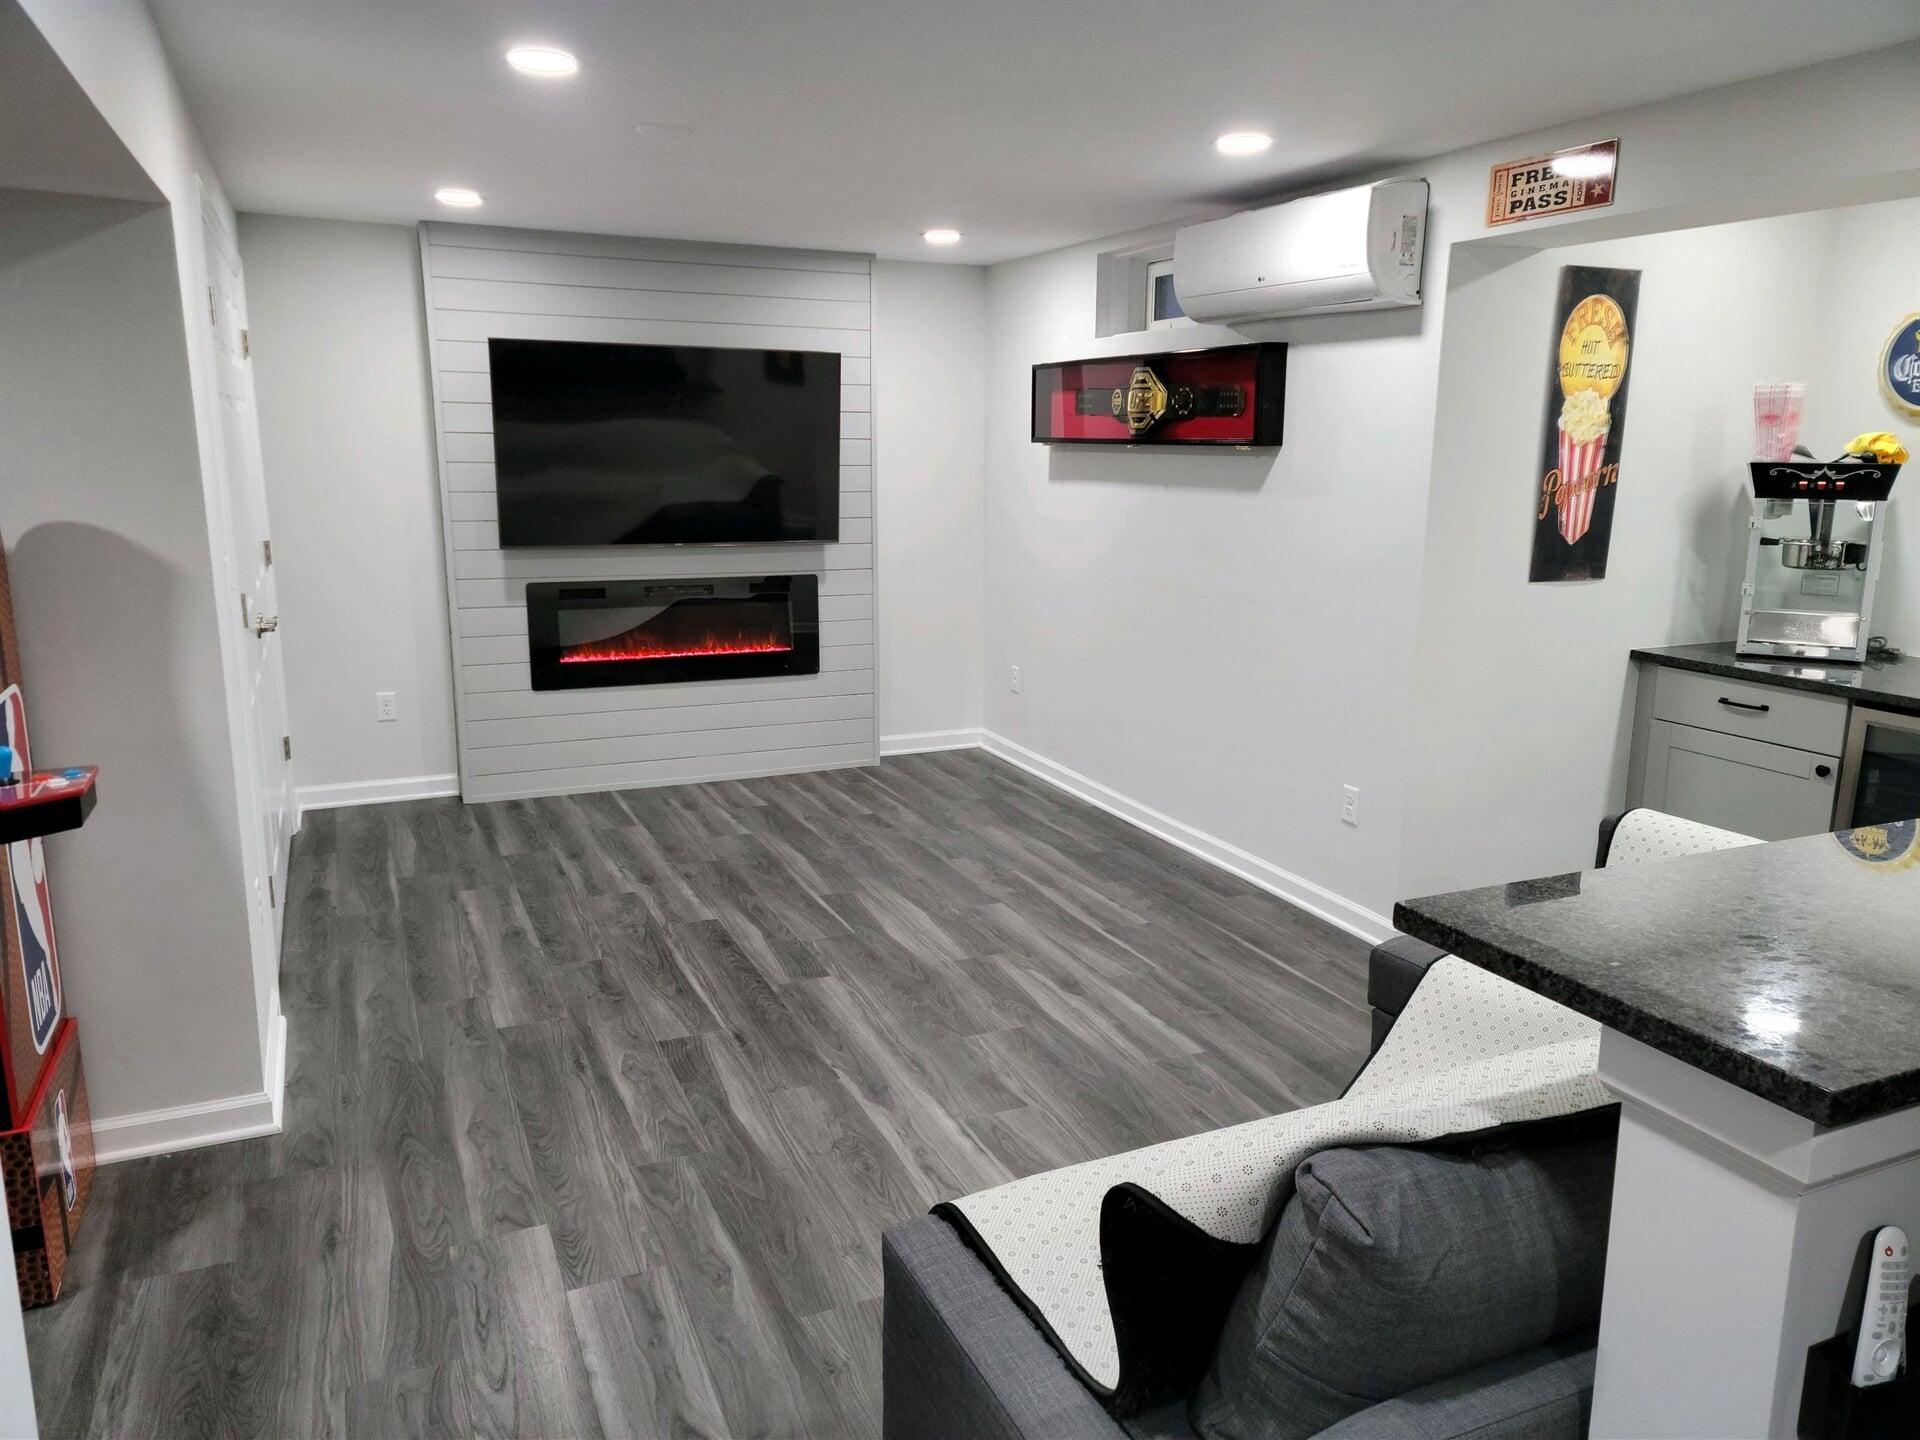 Luxury vinyl plank flooring in Freehold Township, NJ from Carpet Yard